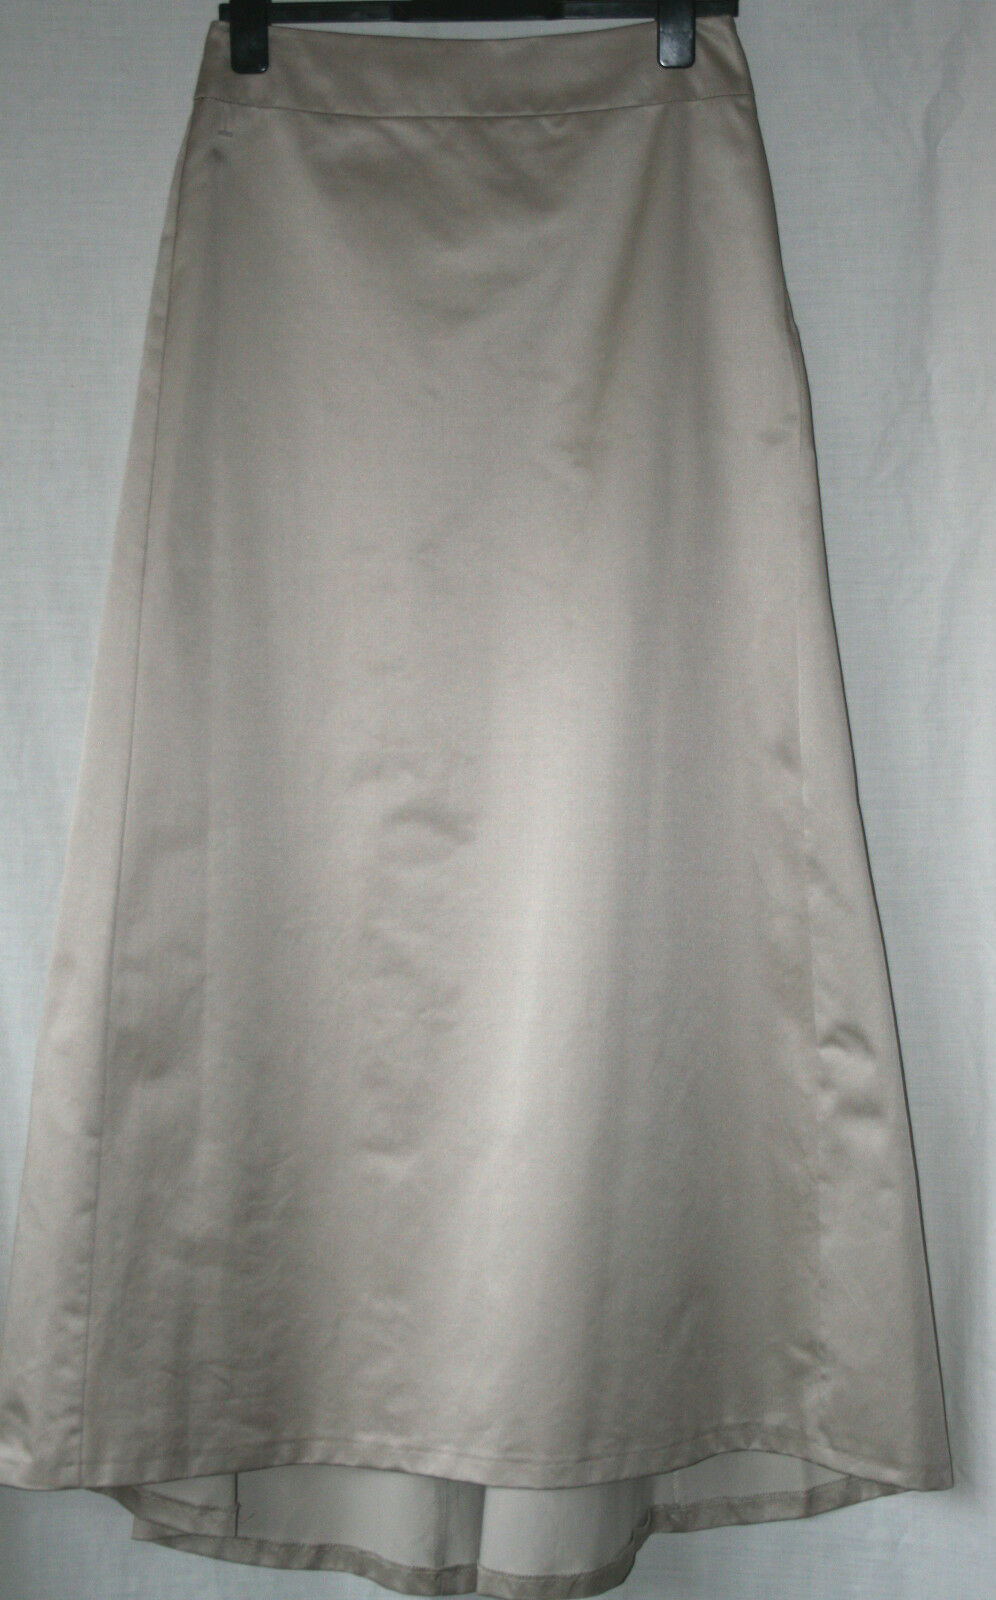 MONSOON (UK10 / EU38) NEW MOCHA 'VENUS' BRIDESMAID FULL-LENGTH LINED SKIRT